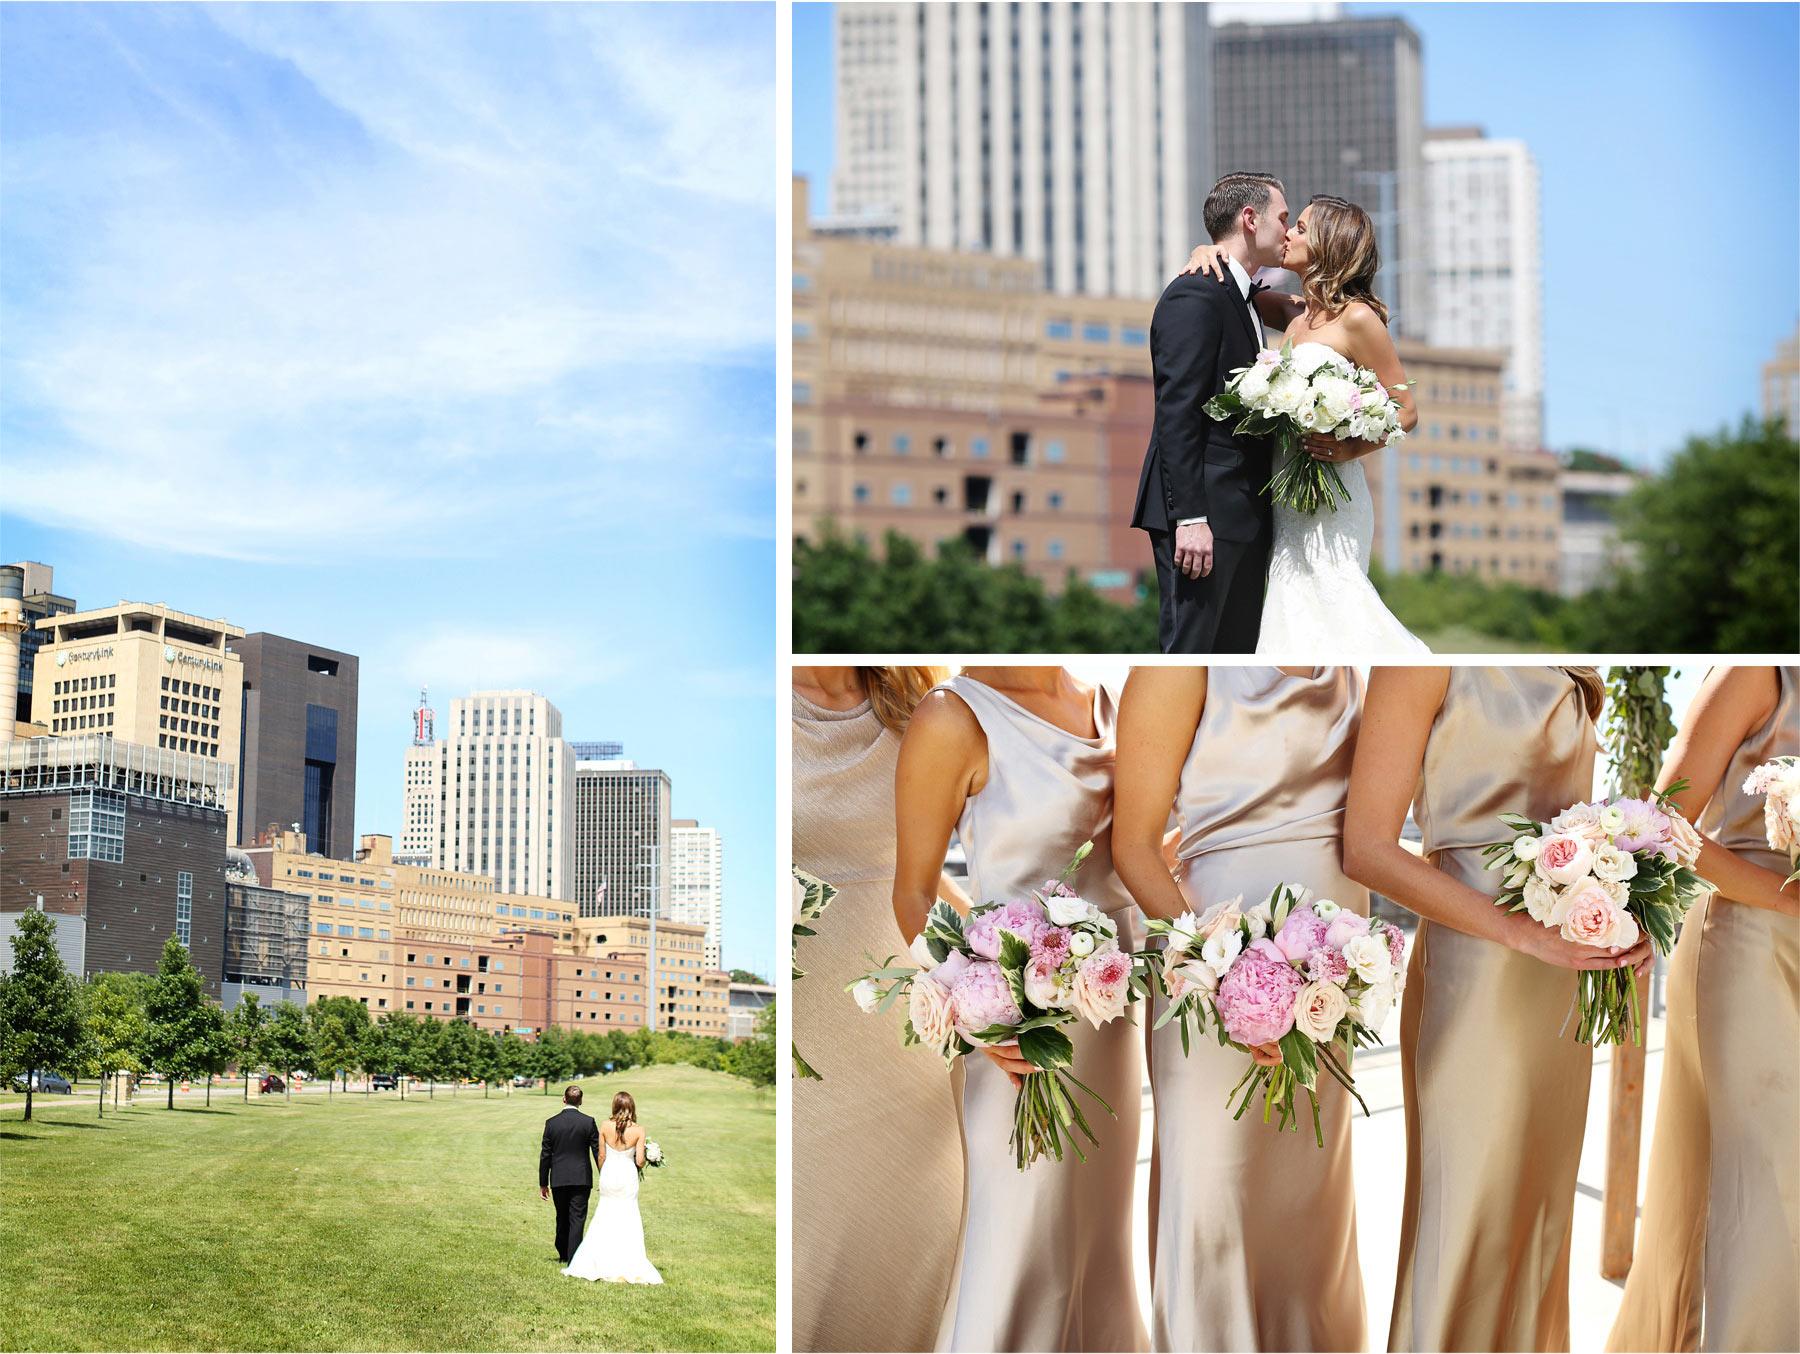 10-Saint-Paul-Minnesota-Wedding-Photographer-by-Andrew-Vick-Photography-Summer-First-Meeting-Bride-Groom-Bridesmaids-Flowers-Kiss-Molly-and-Dan.jpg